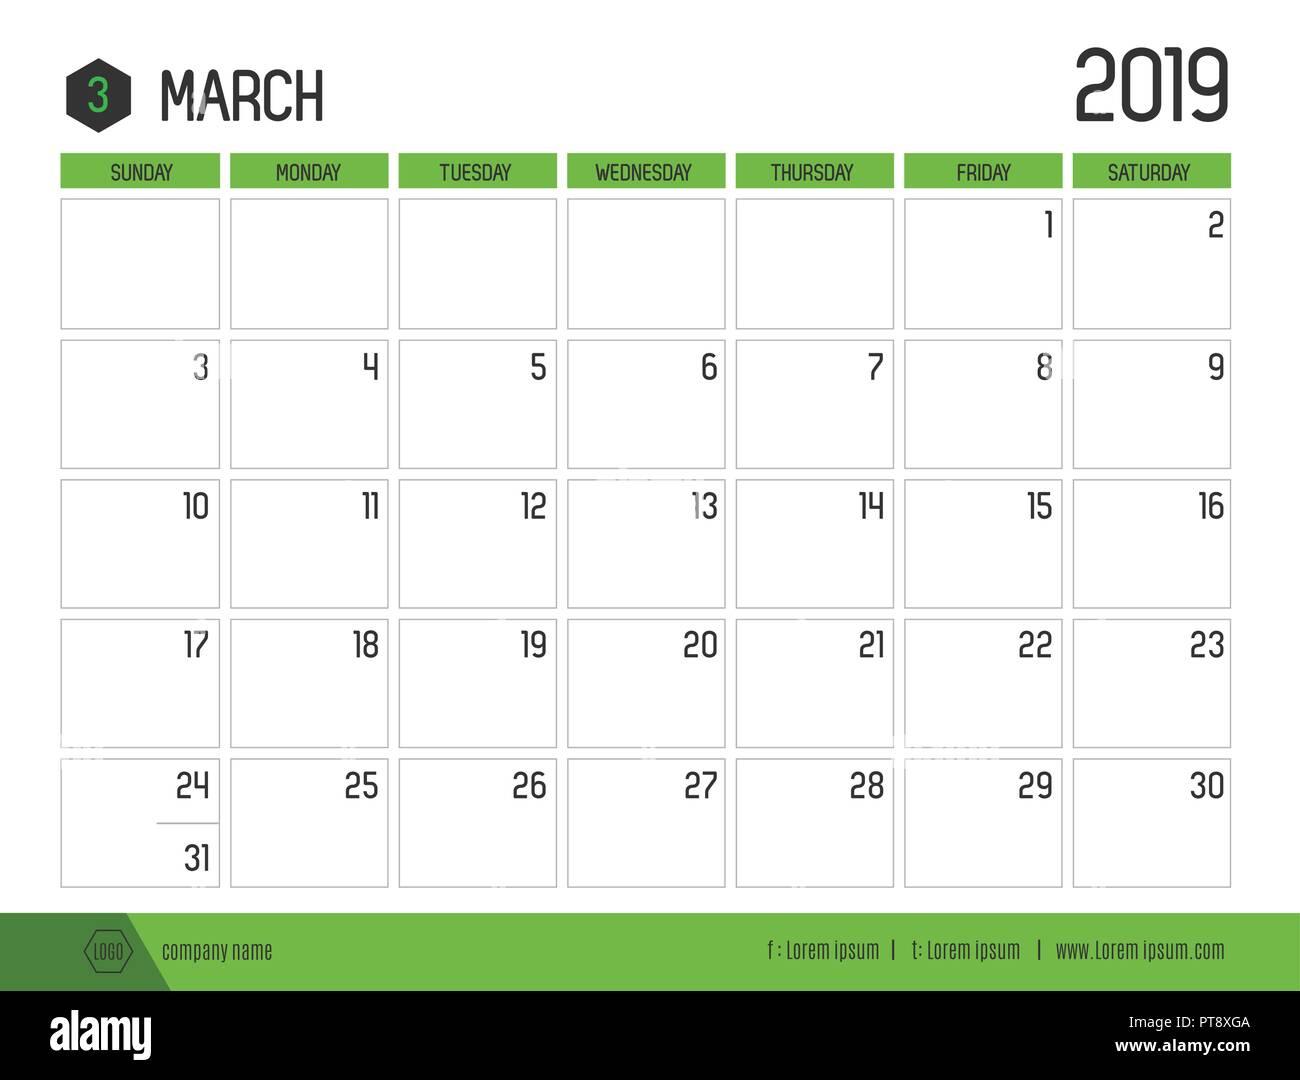 Marzo Calendario.Vettore Del Moderno Calendario Verde 2019 Marzo In Semplice